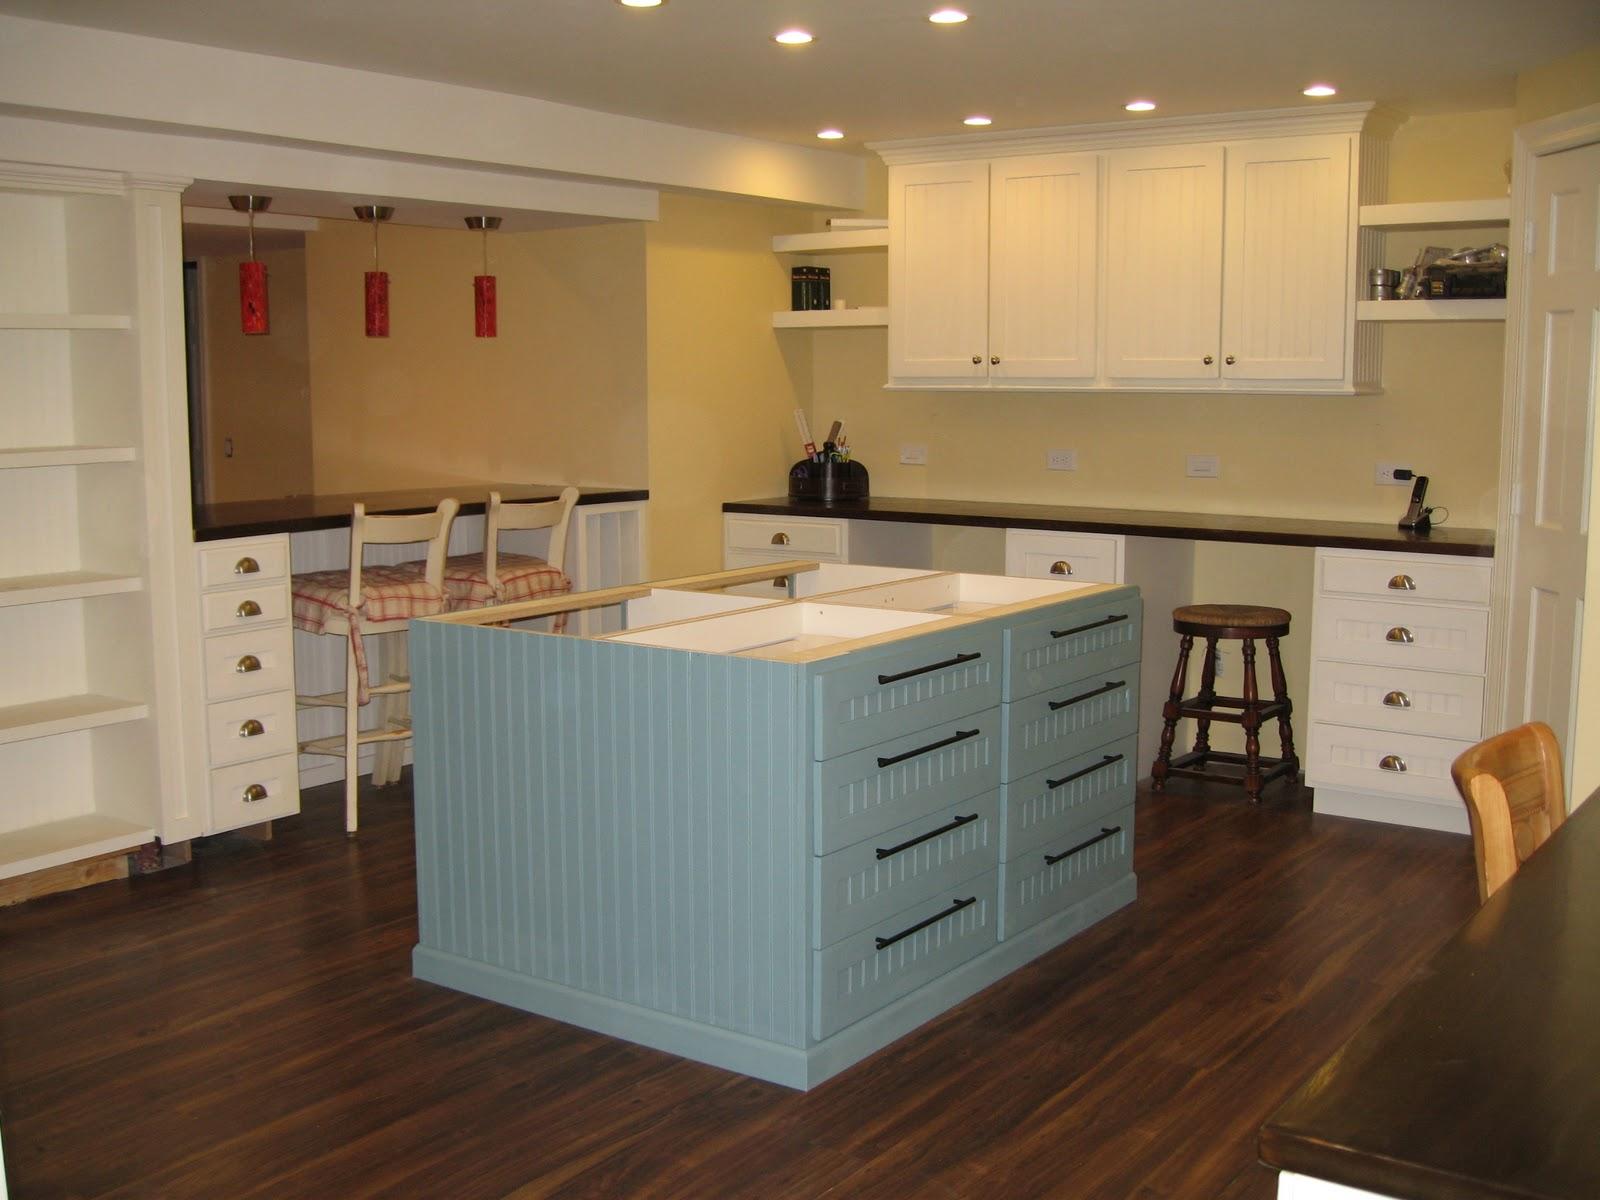 Craft room cabinets idea - Craft Room Inspiration